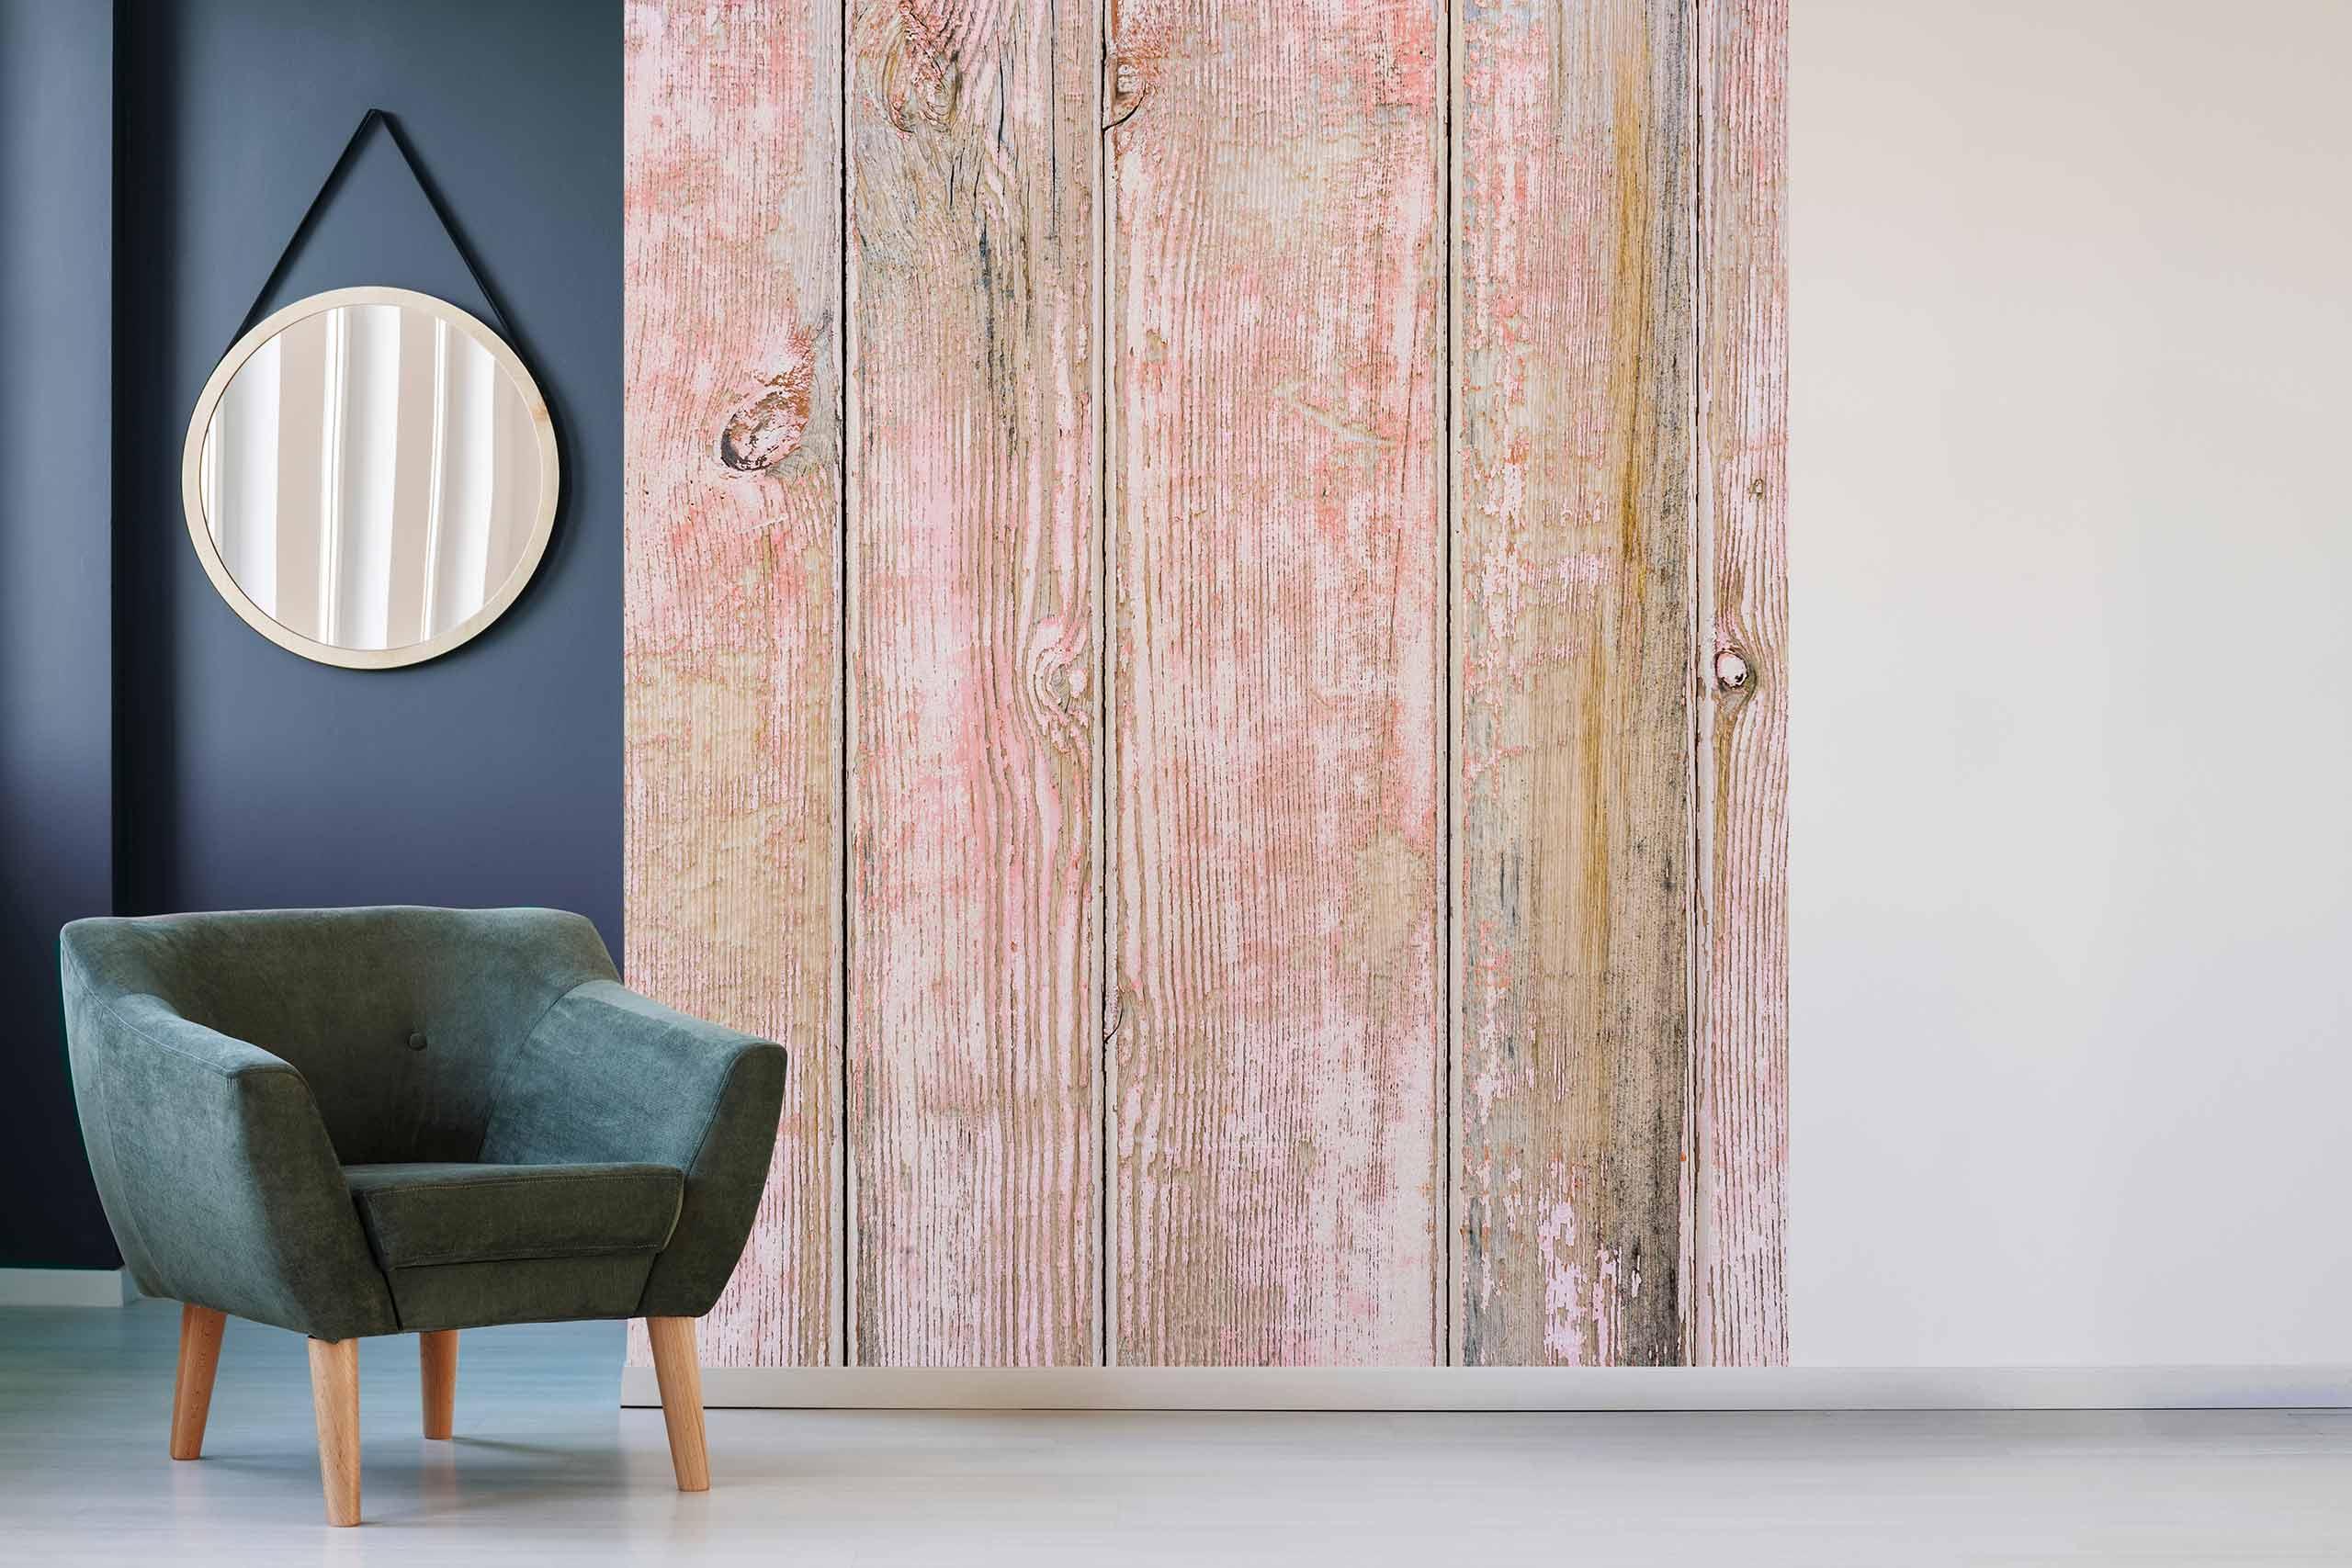 Vlies Tapete 225 Fototapete Höhe 250cm Motiv 114 Holzbretter Vintage